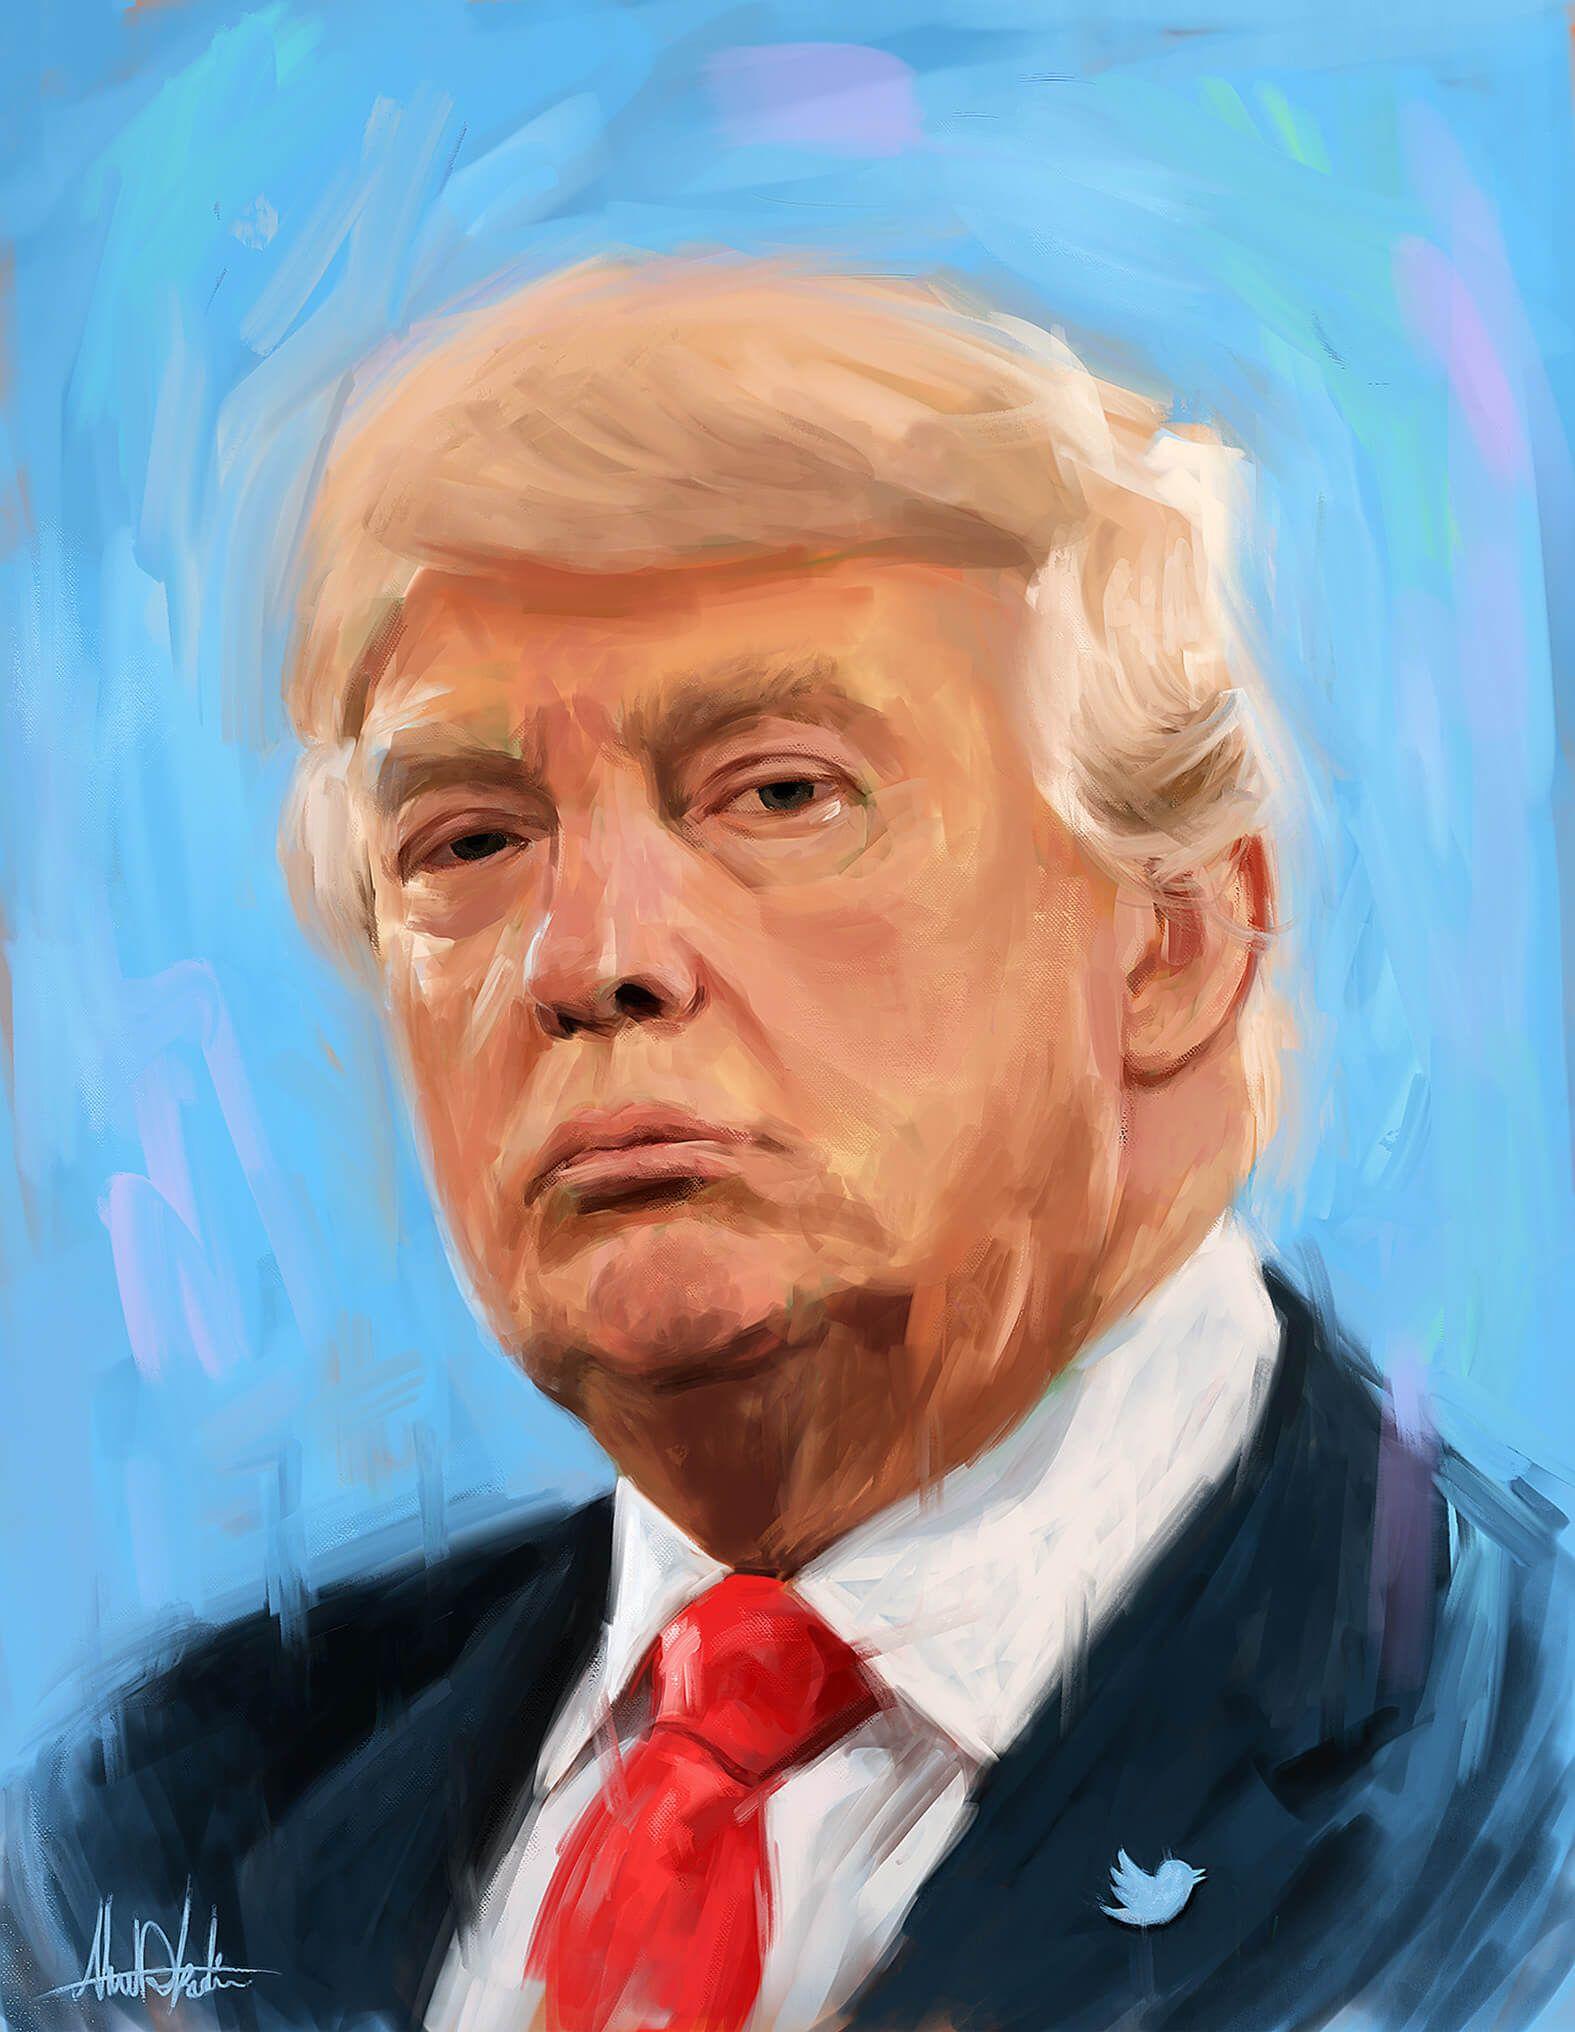 portrait painting for Donald Trump Worth 2 Billion dollars ...